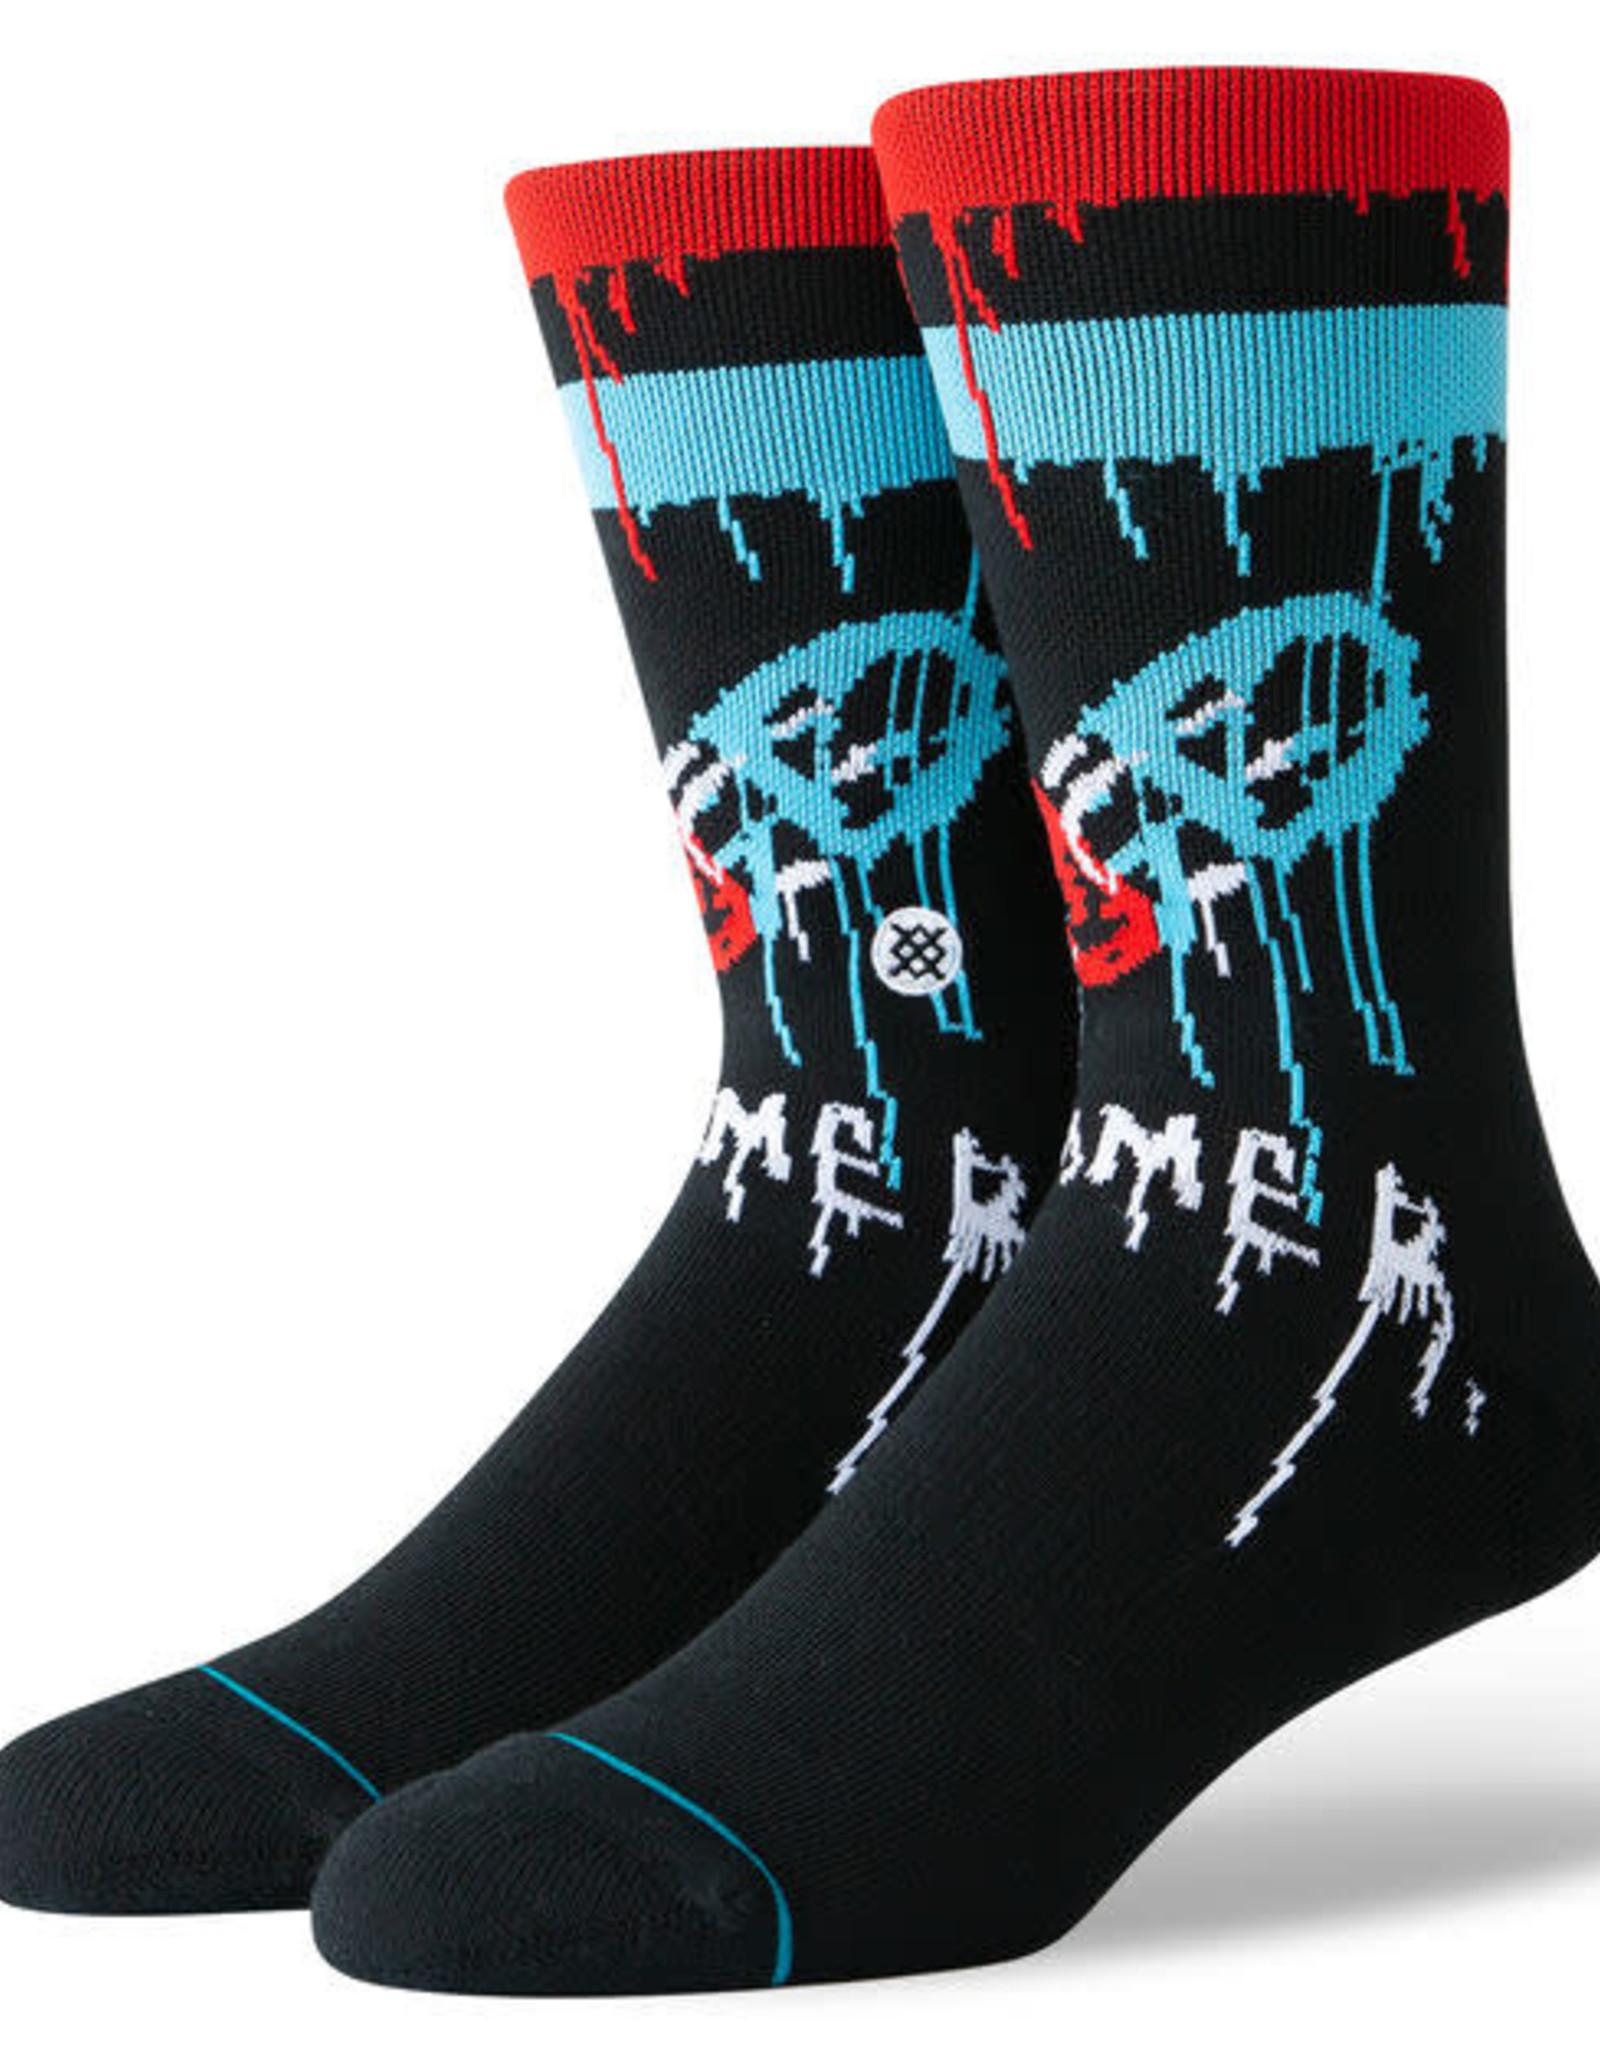 STANCE - The Bomb Socks